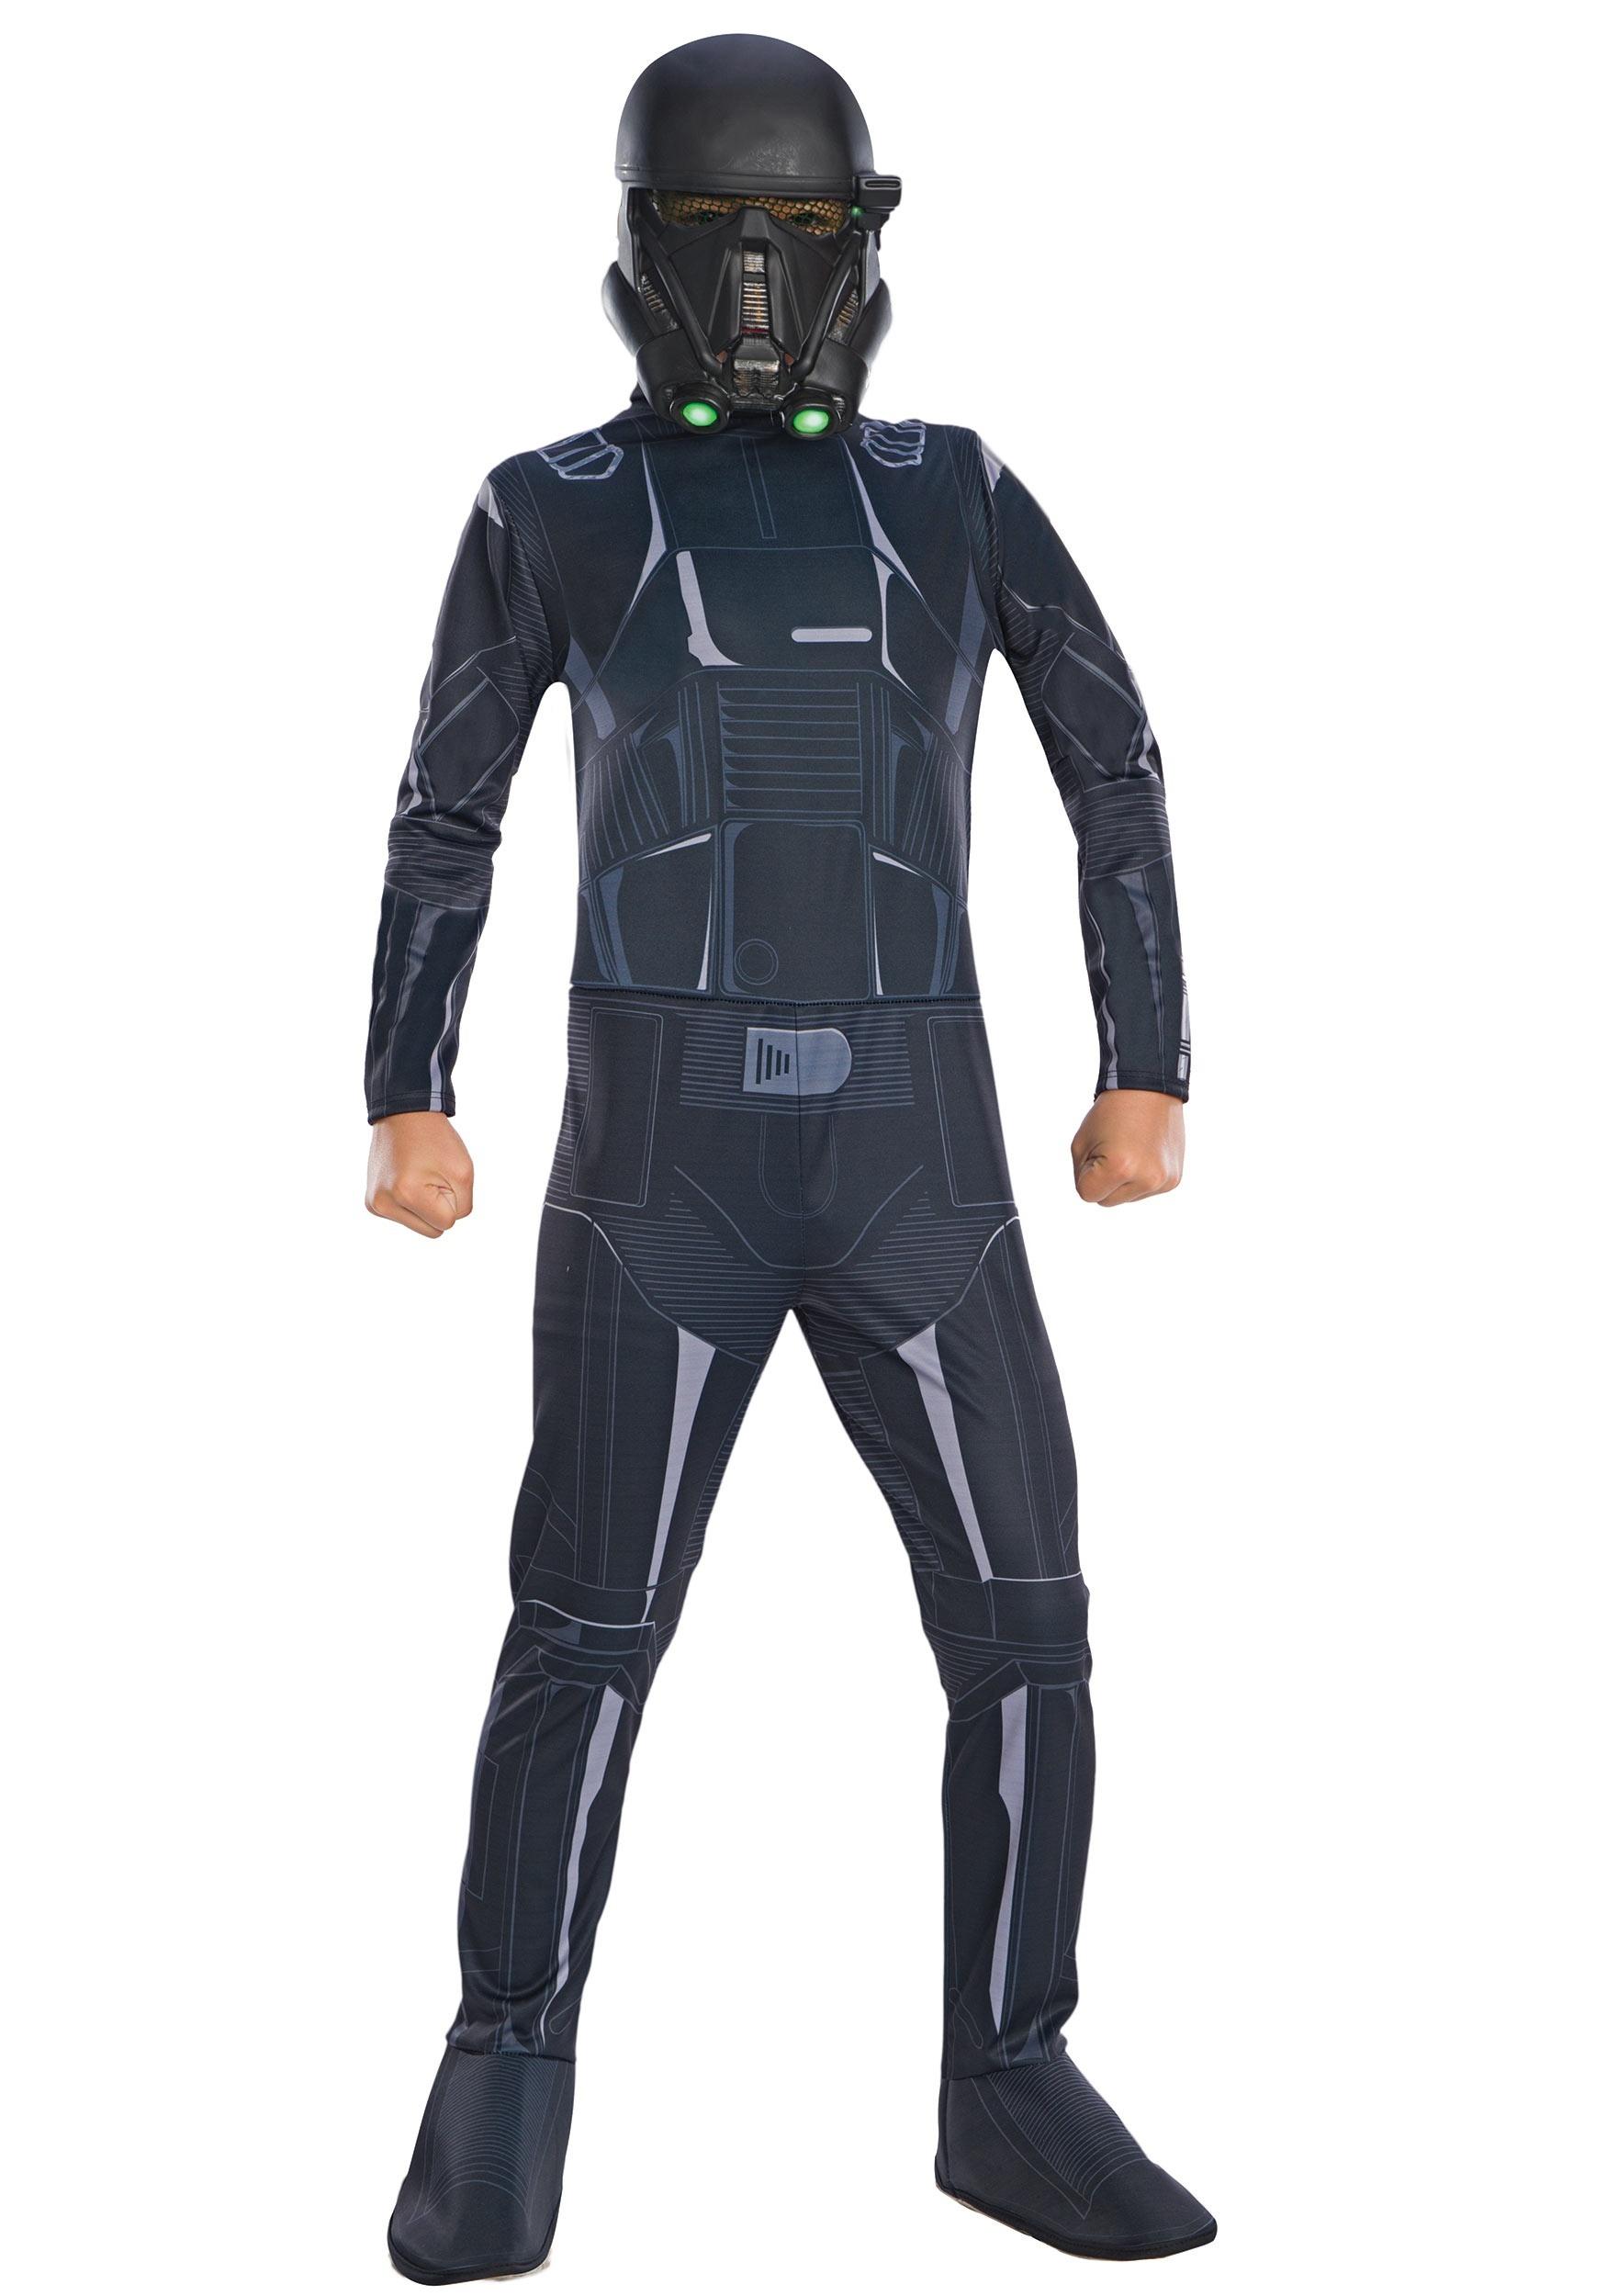 Star Wars: The Mandalorian Death Trooper Costume for Kids